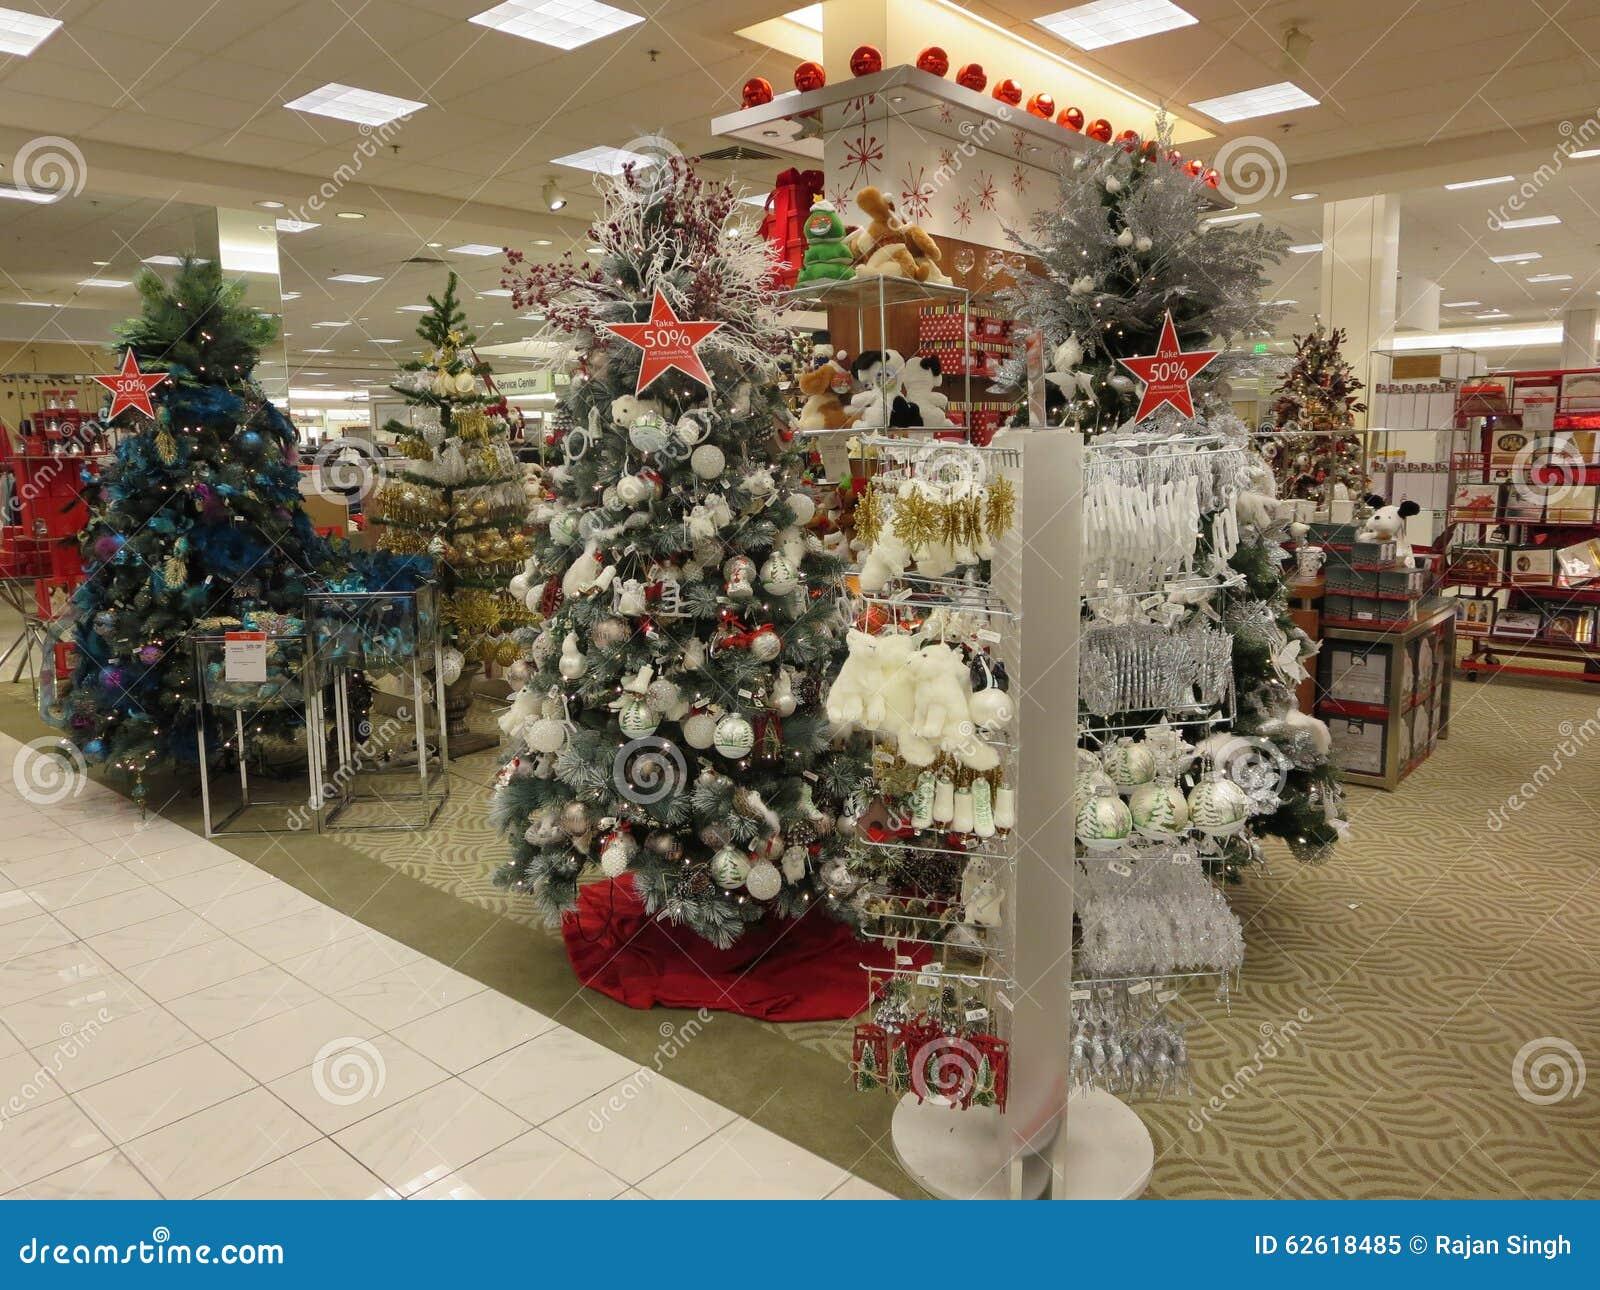 Christmas Trees Macys Store Editorial Image - Image: 62618485